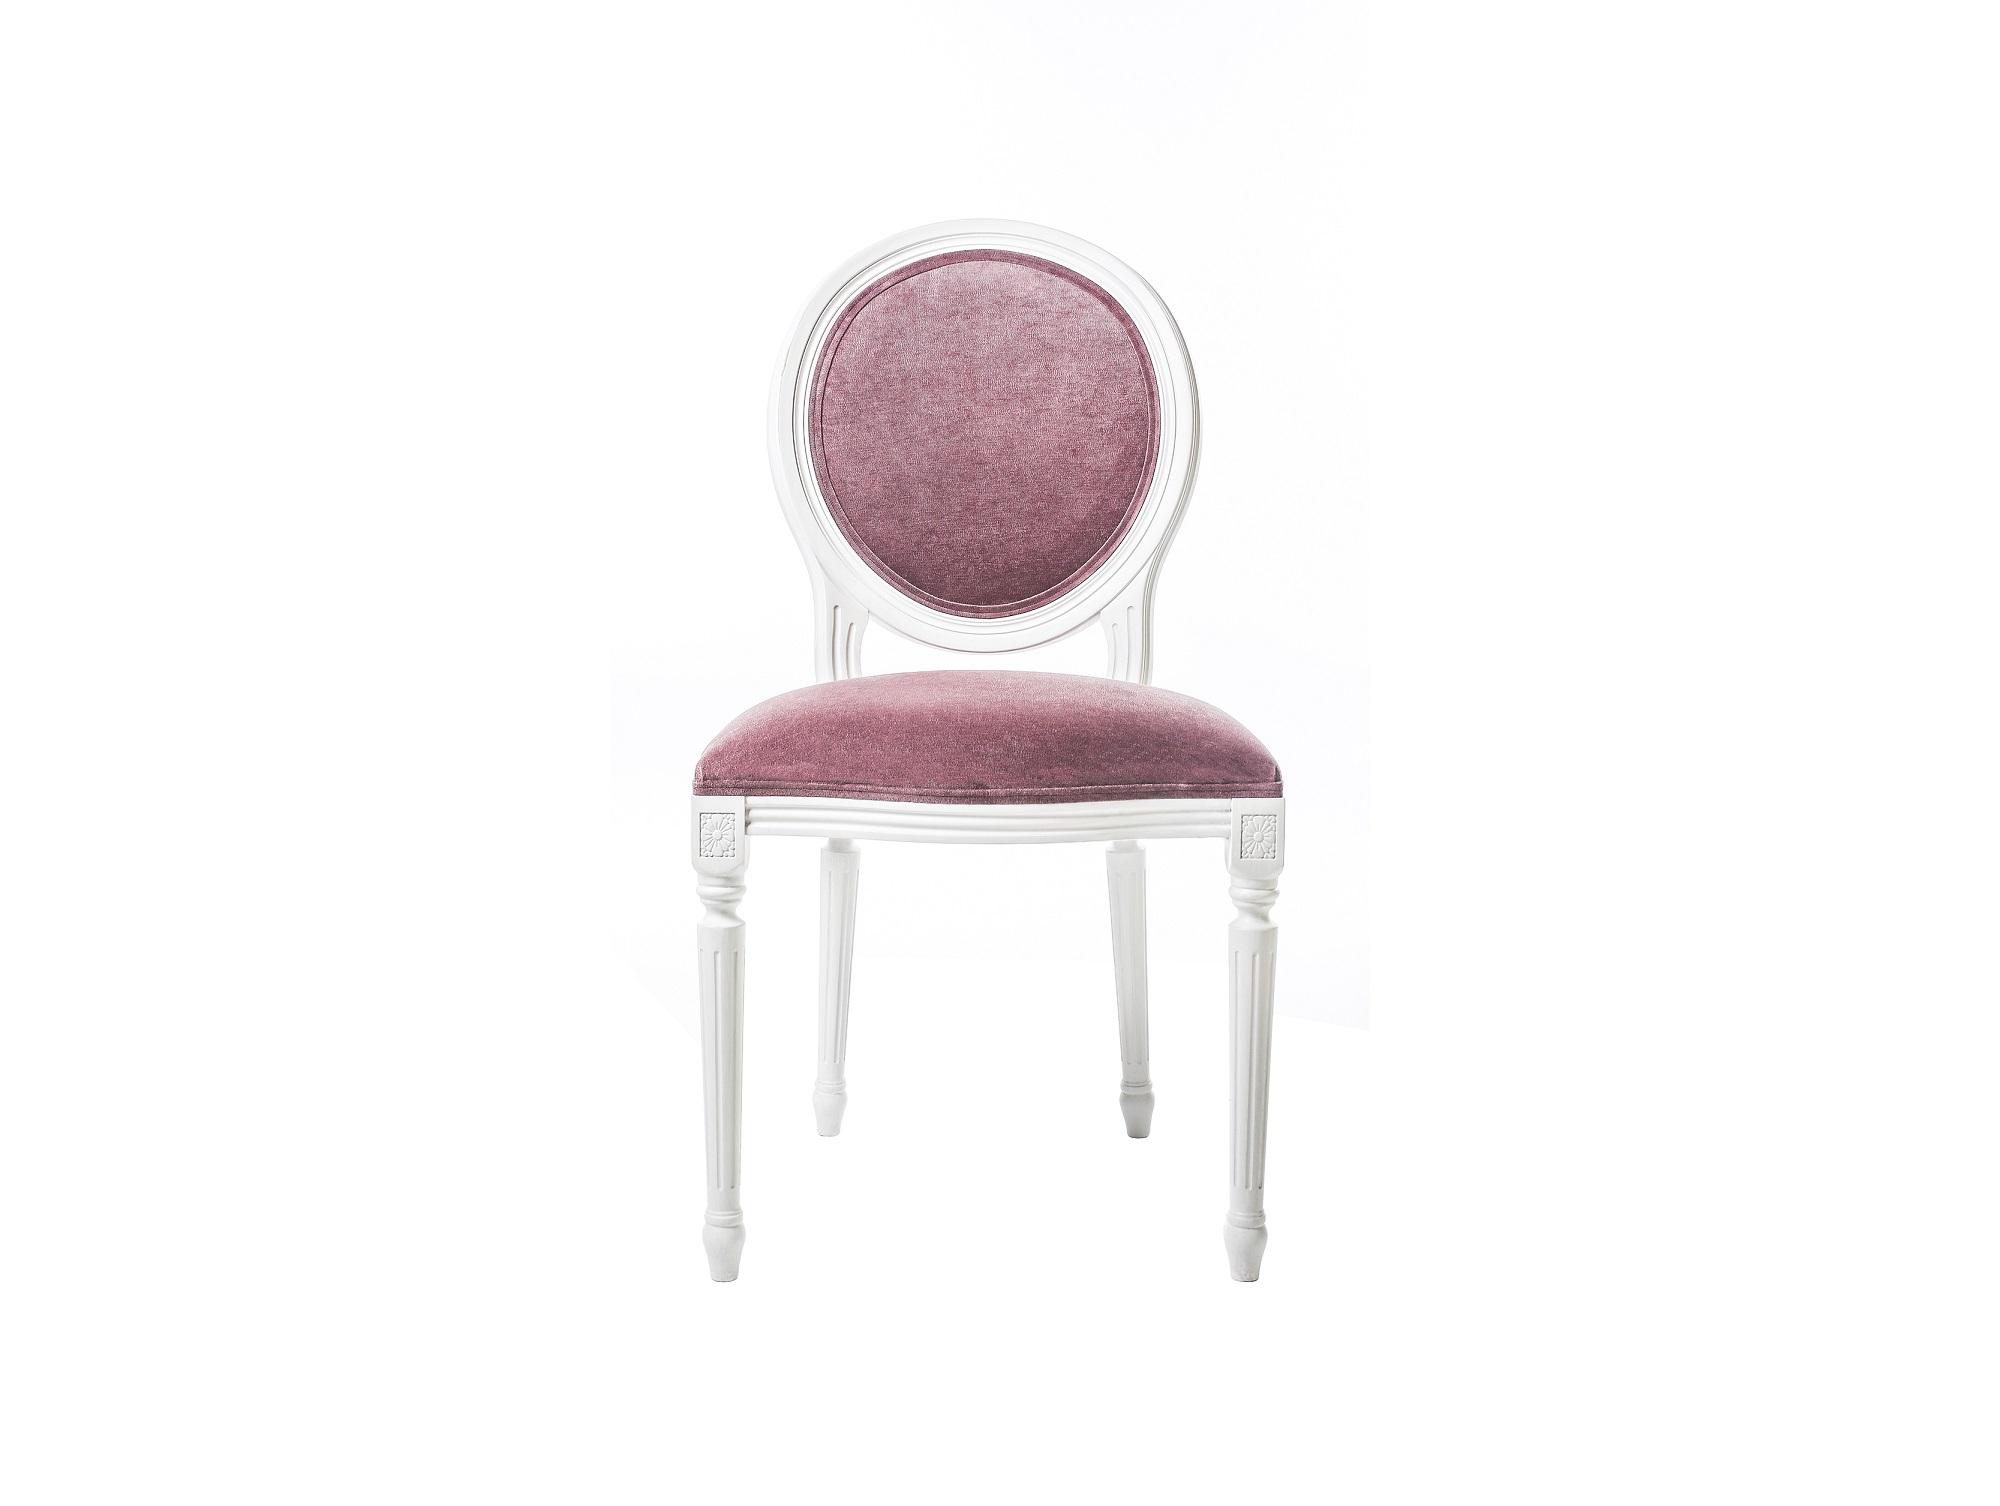 Кухонный стул La Neige 15443655 от thefurnish